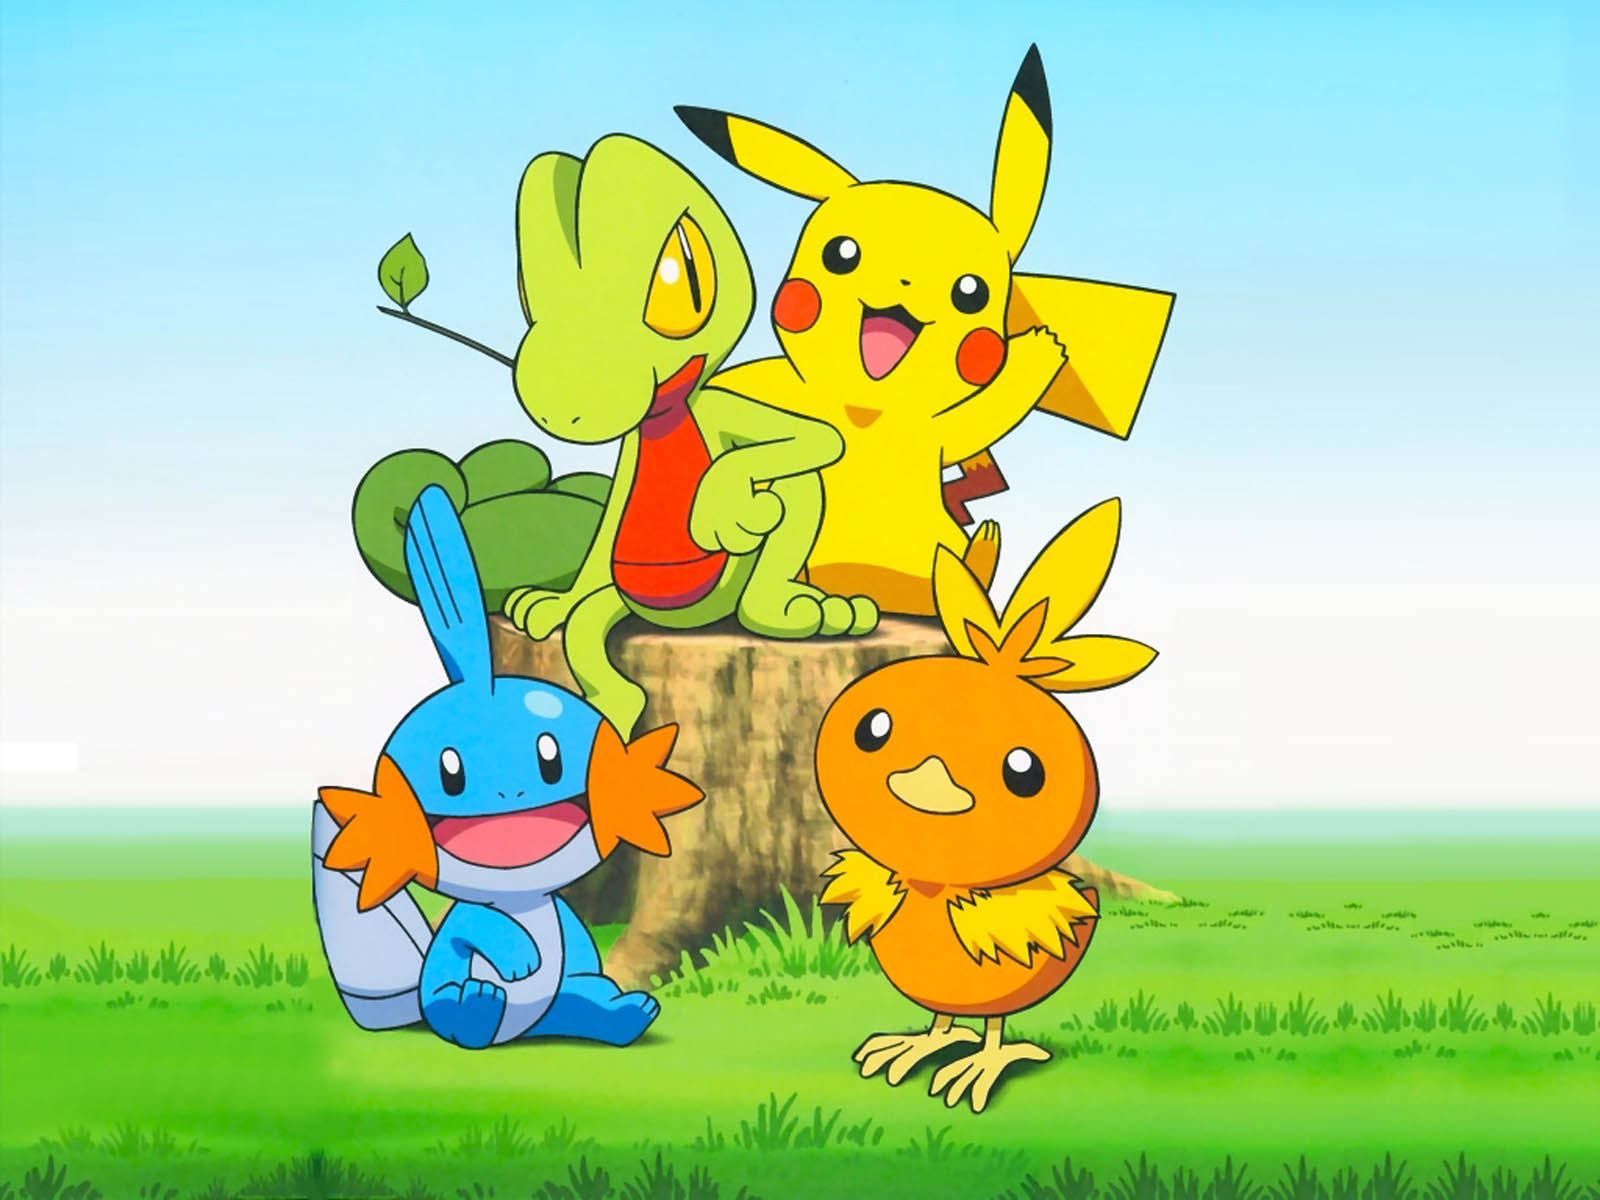 wallpapers Pokemon Wallpapers 1600x1200